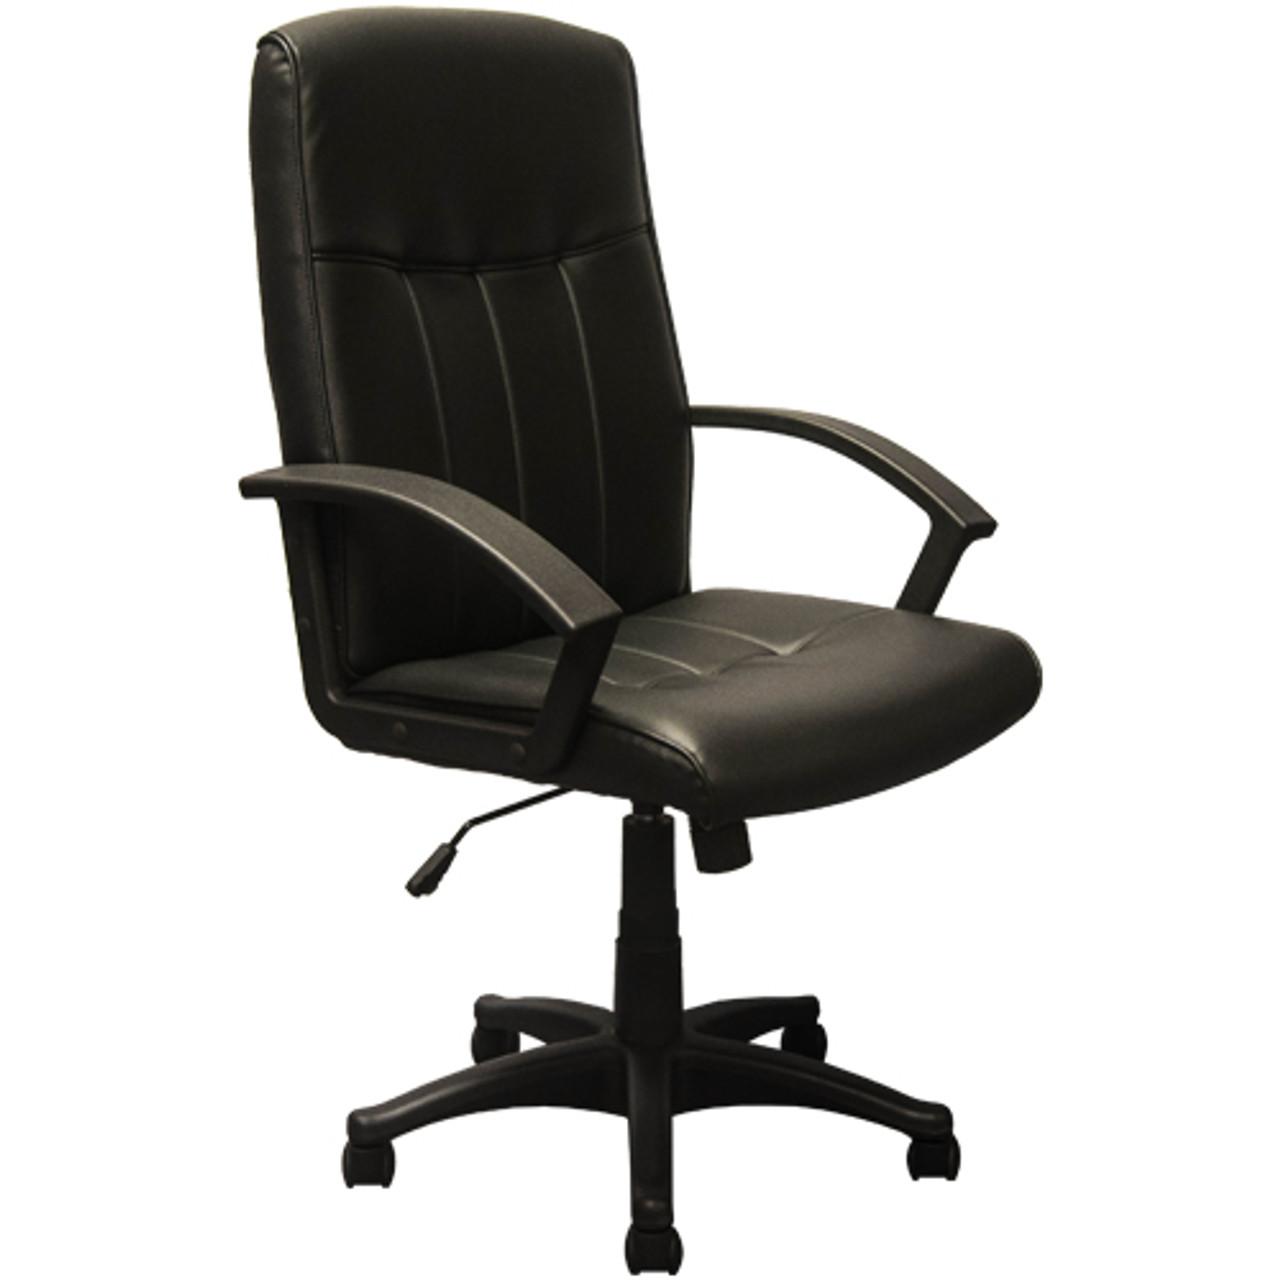 Pleasant Advantage High Back Black Leather Executive Office Chair Kb 3001 Machost Co Dining Chair Design Ideas Machostcouk